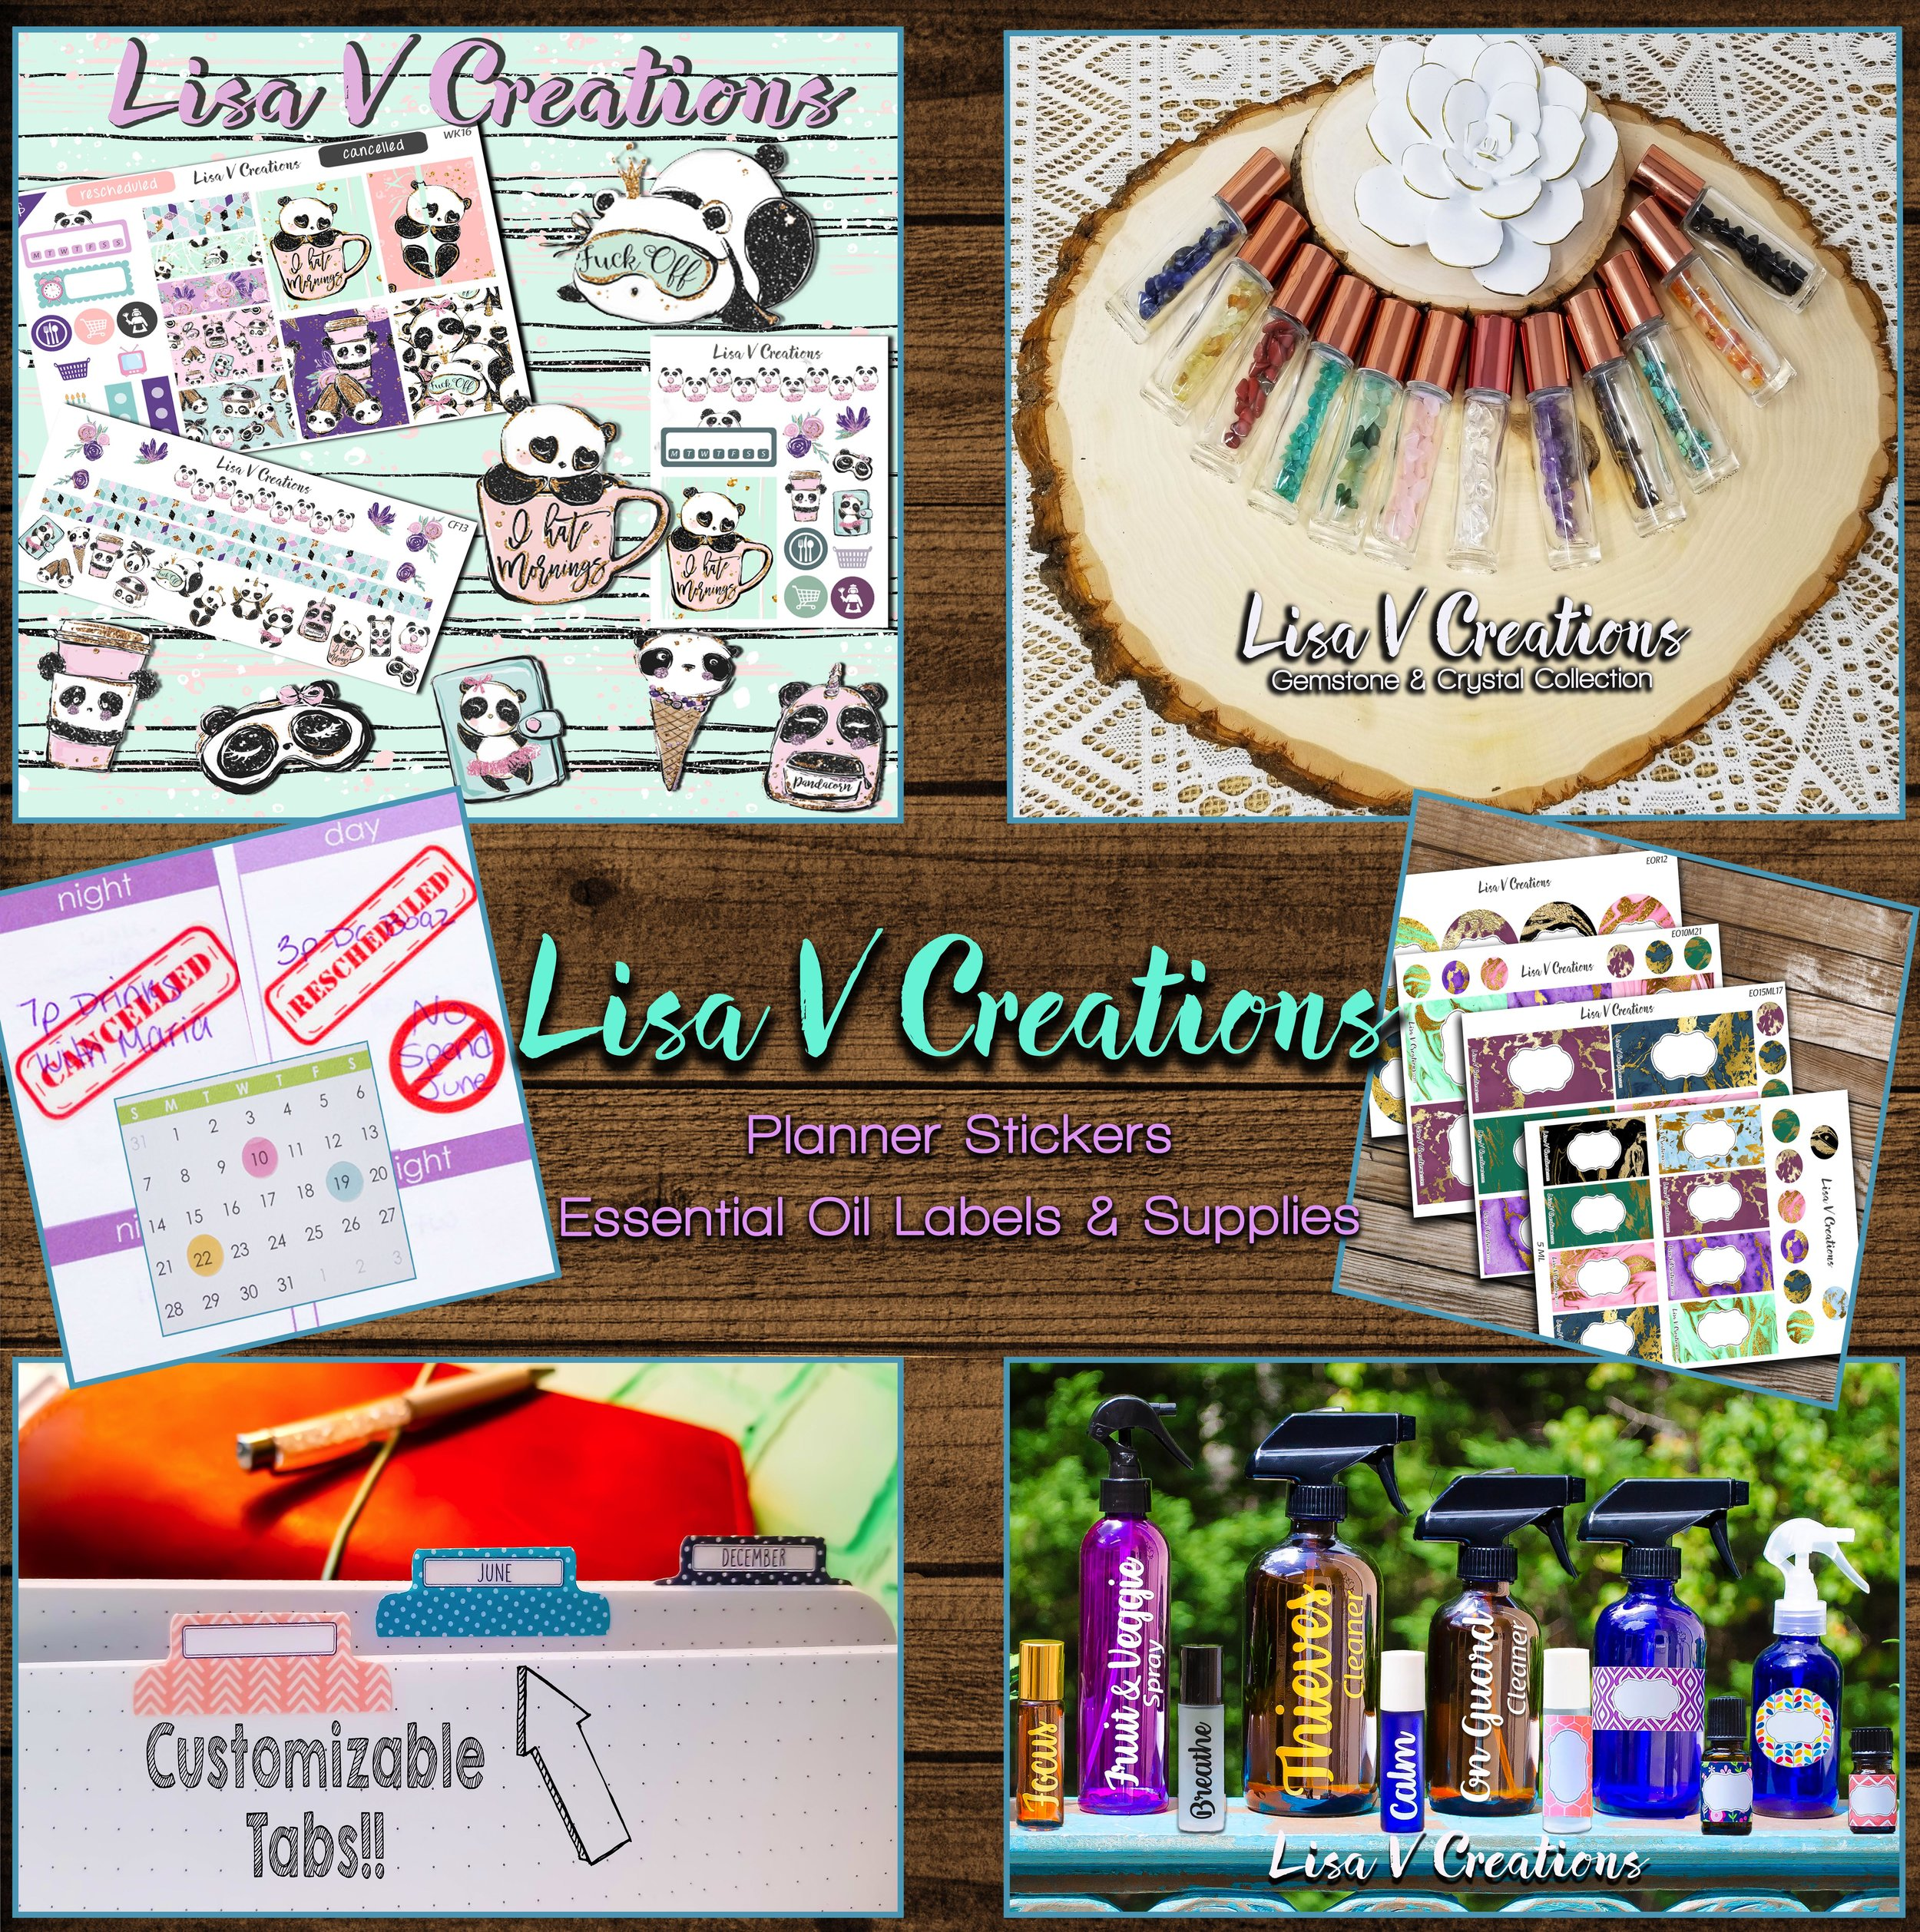 Lisa V Creations